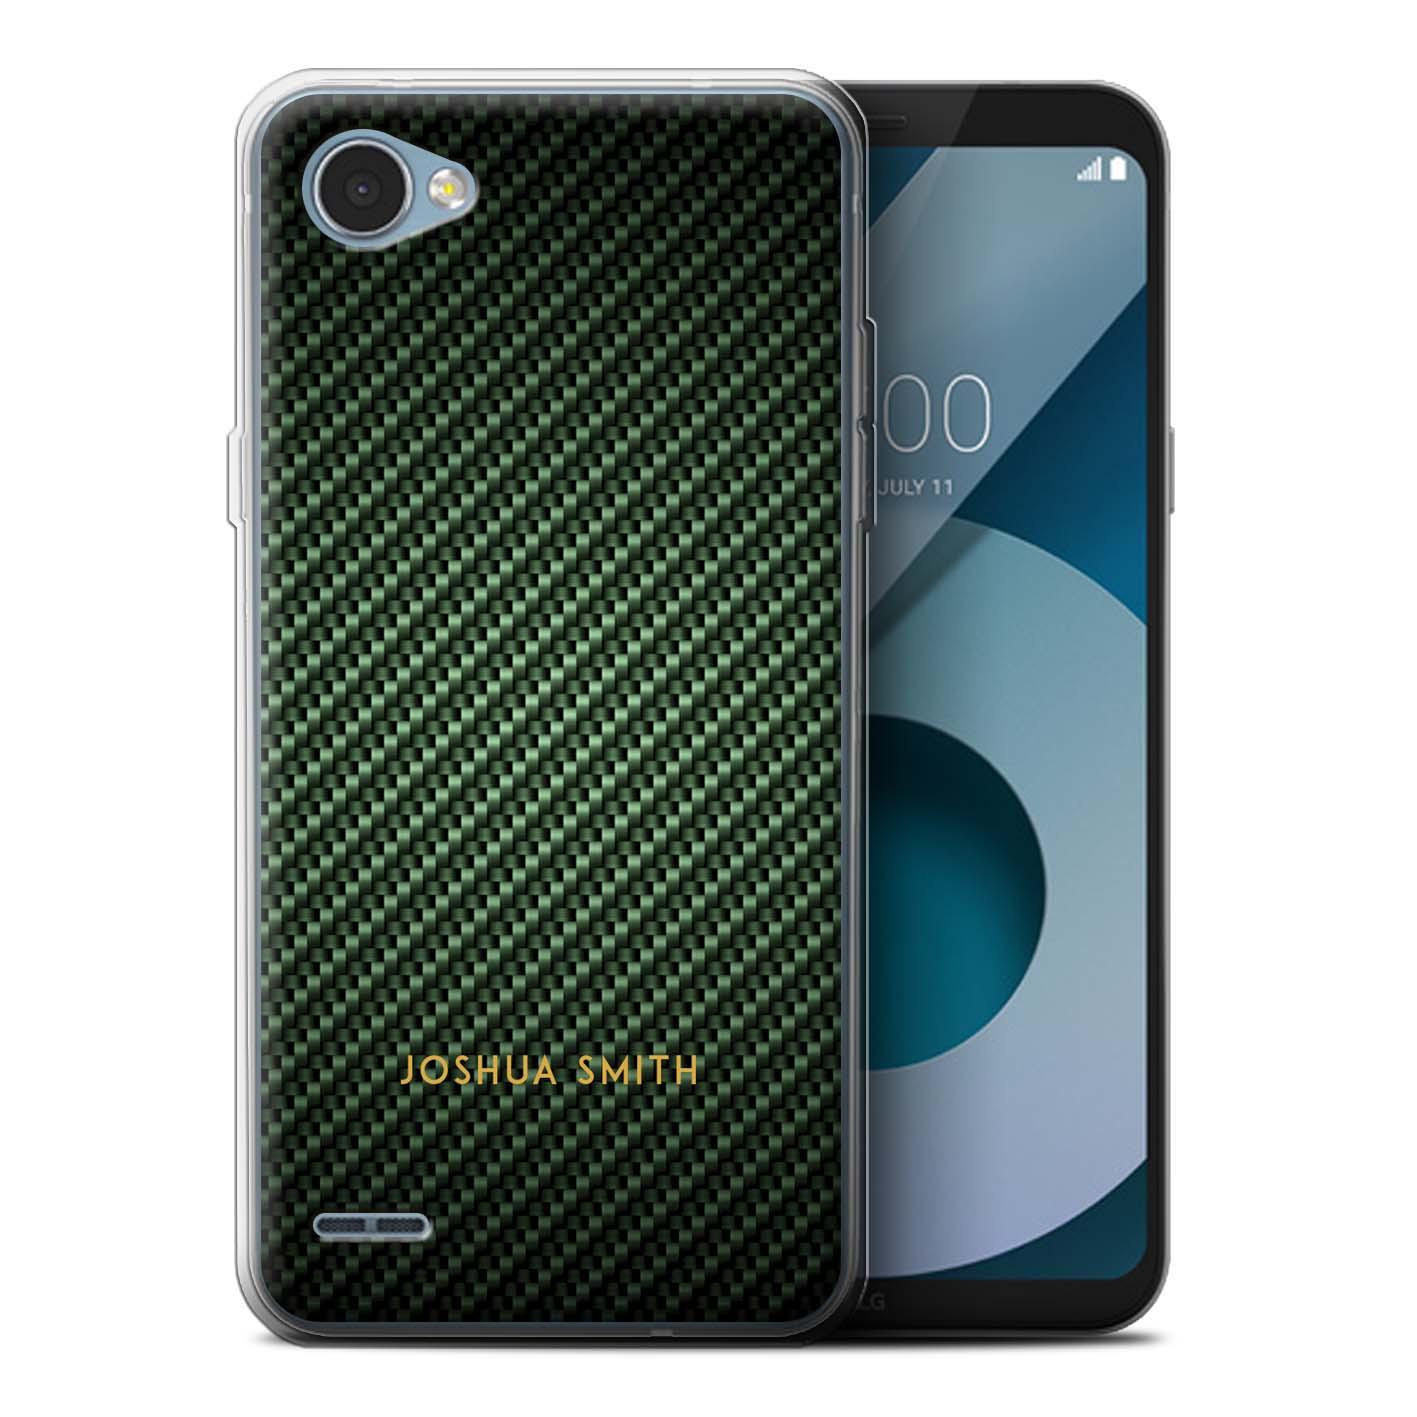 Personalised-Carbon-Fibre-Effect-Case-for-LG-Q6-M700-Initial-Name-Gel-TPU-Cover miniatuur 13